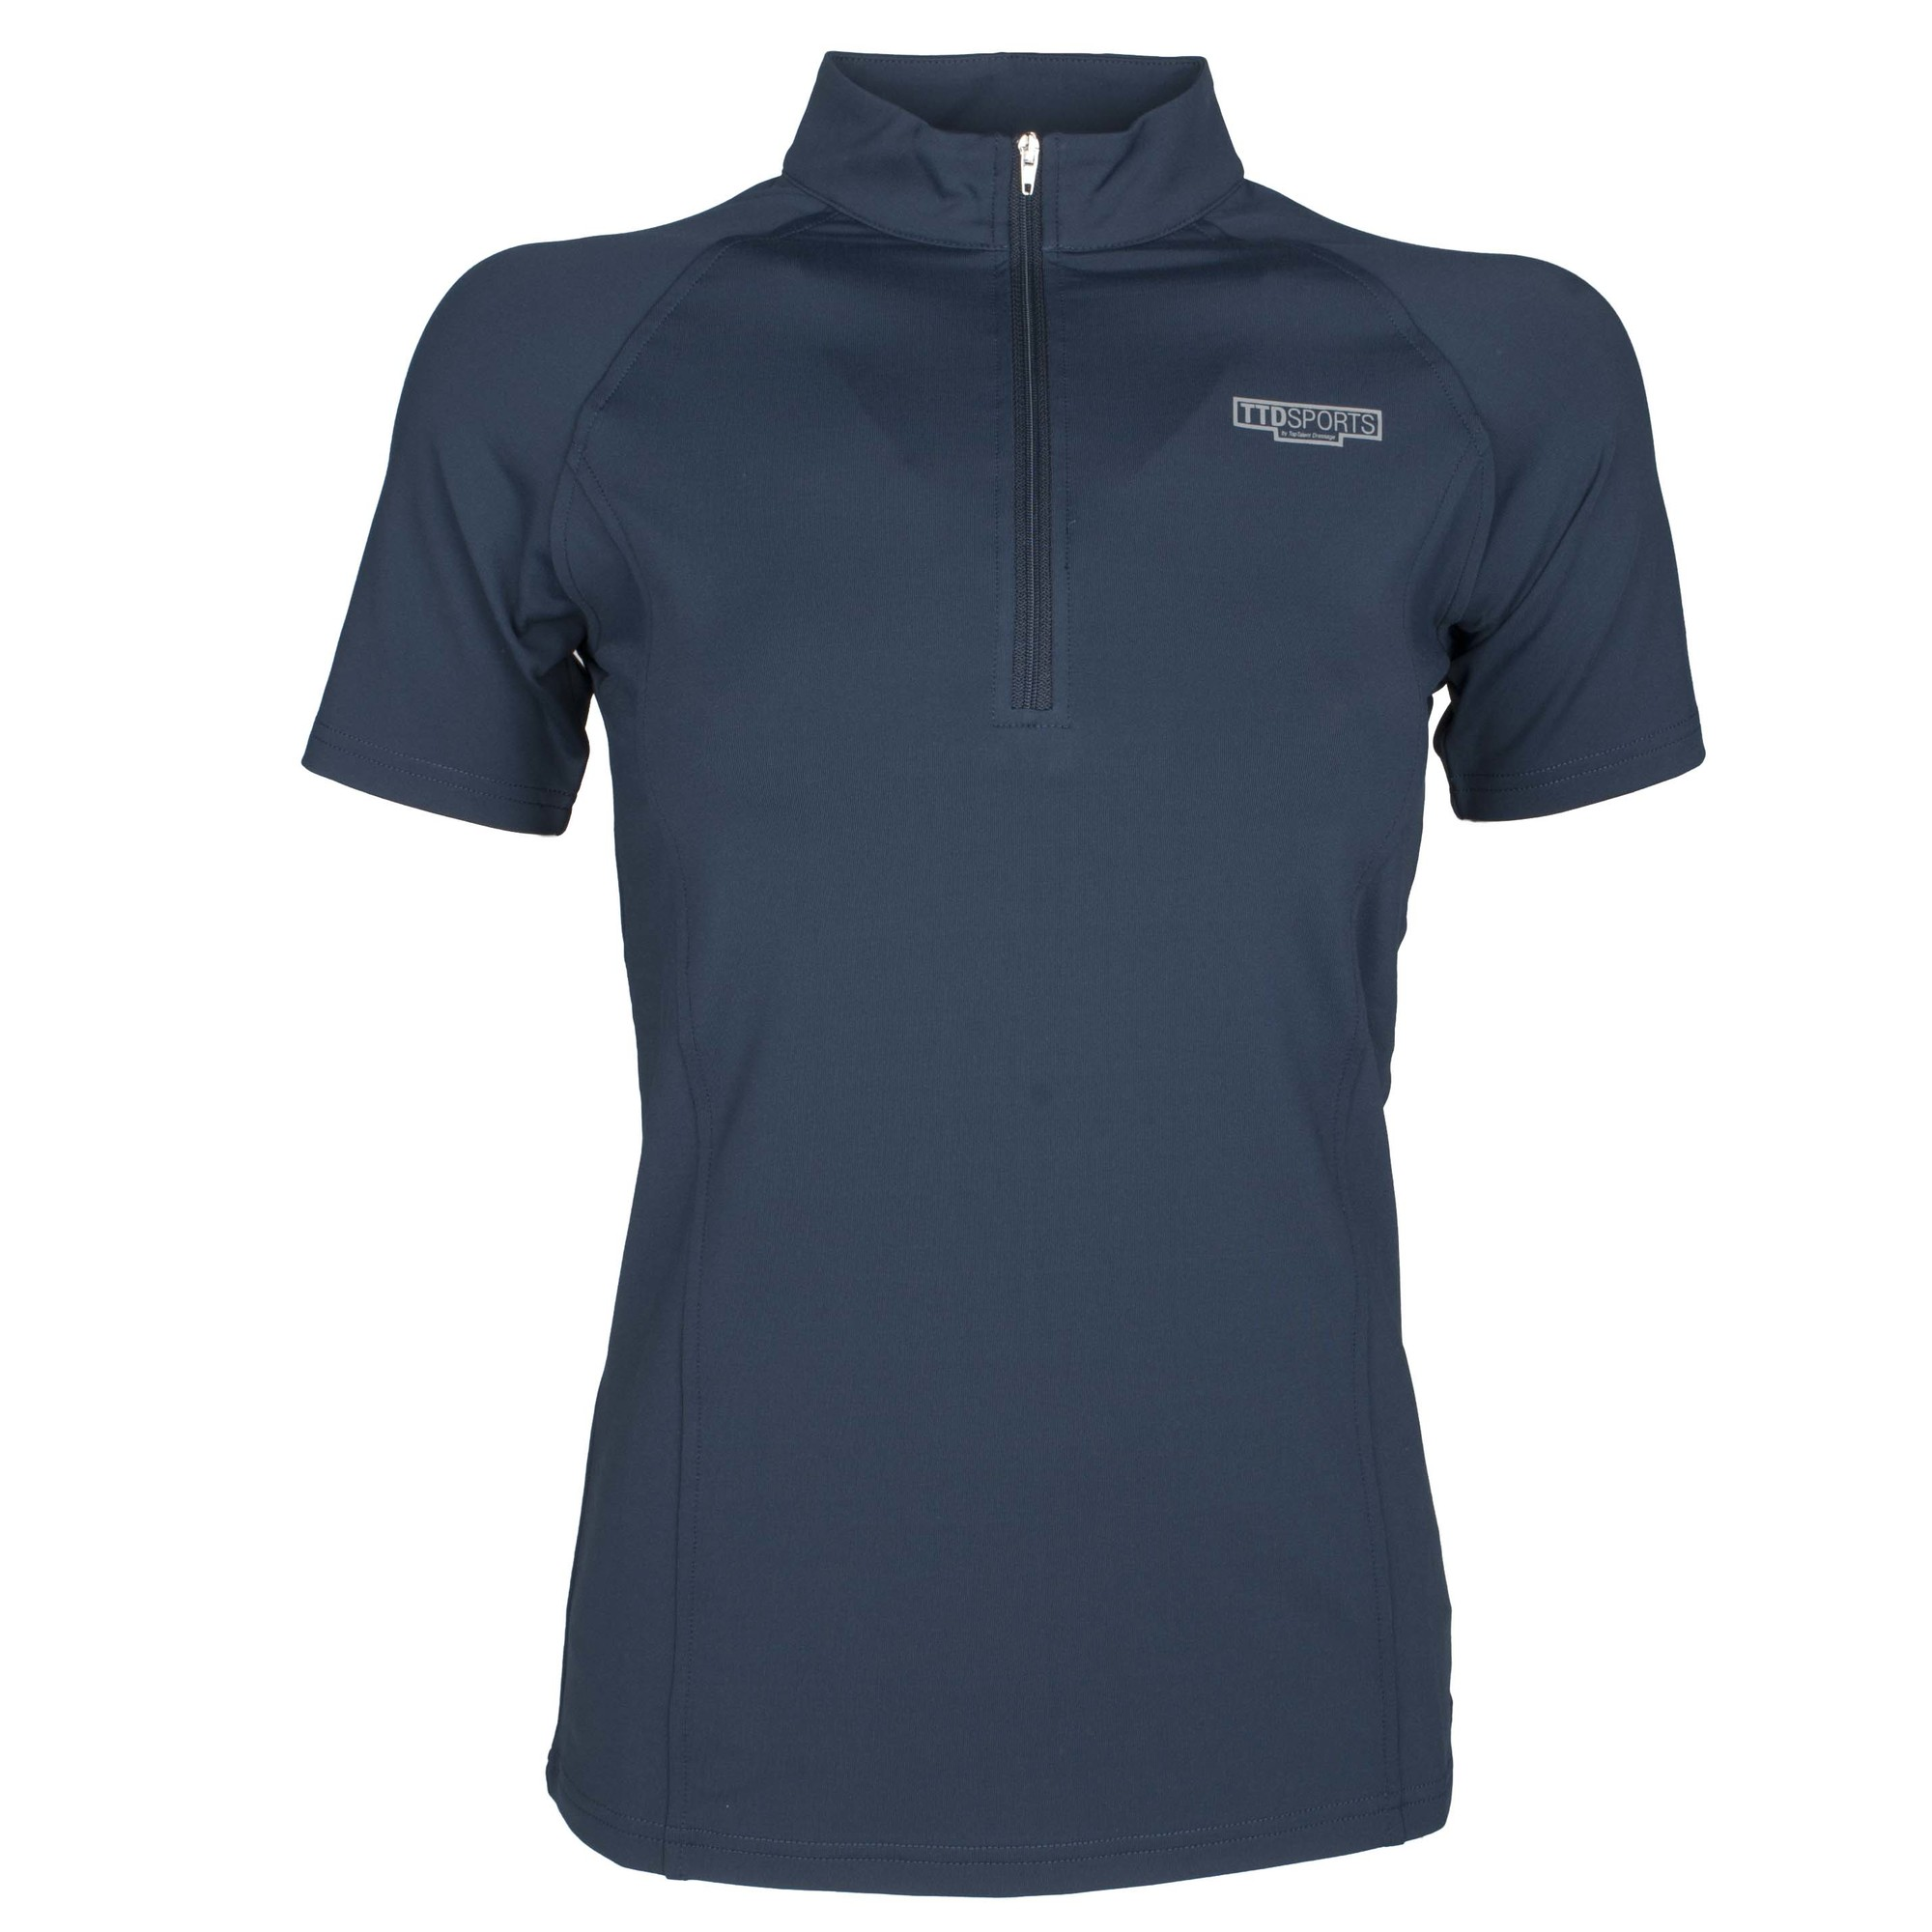 TTD Shaquille tshirt donkerblauw maat:l